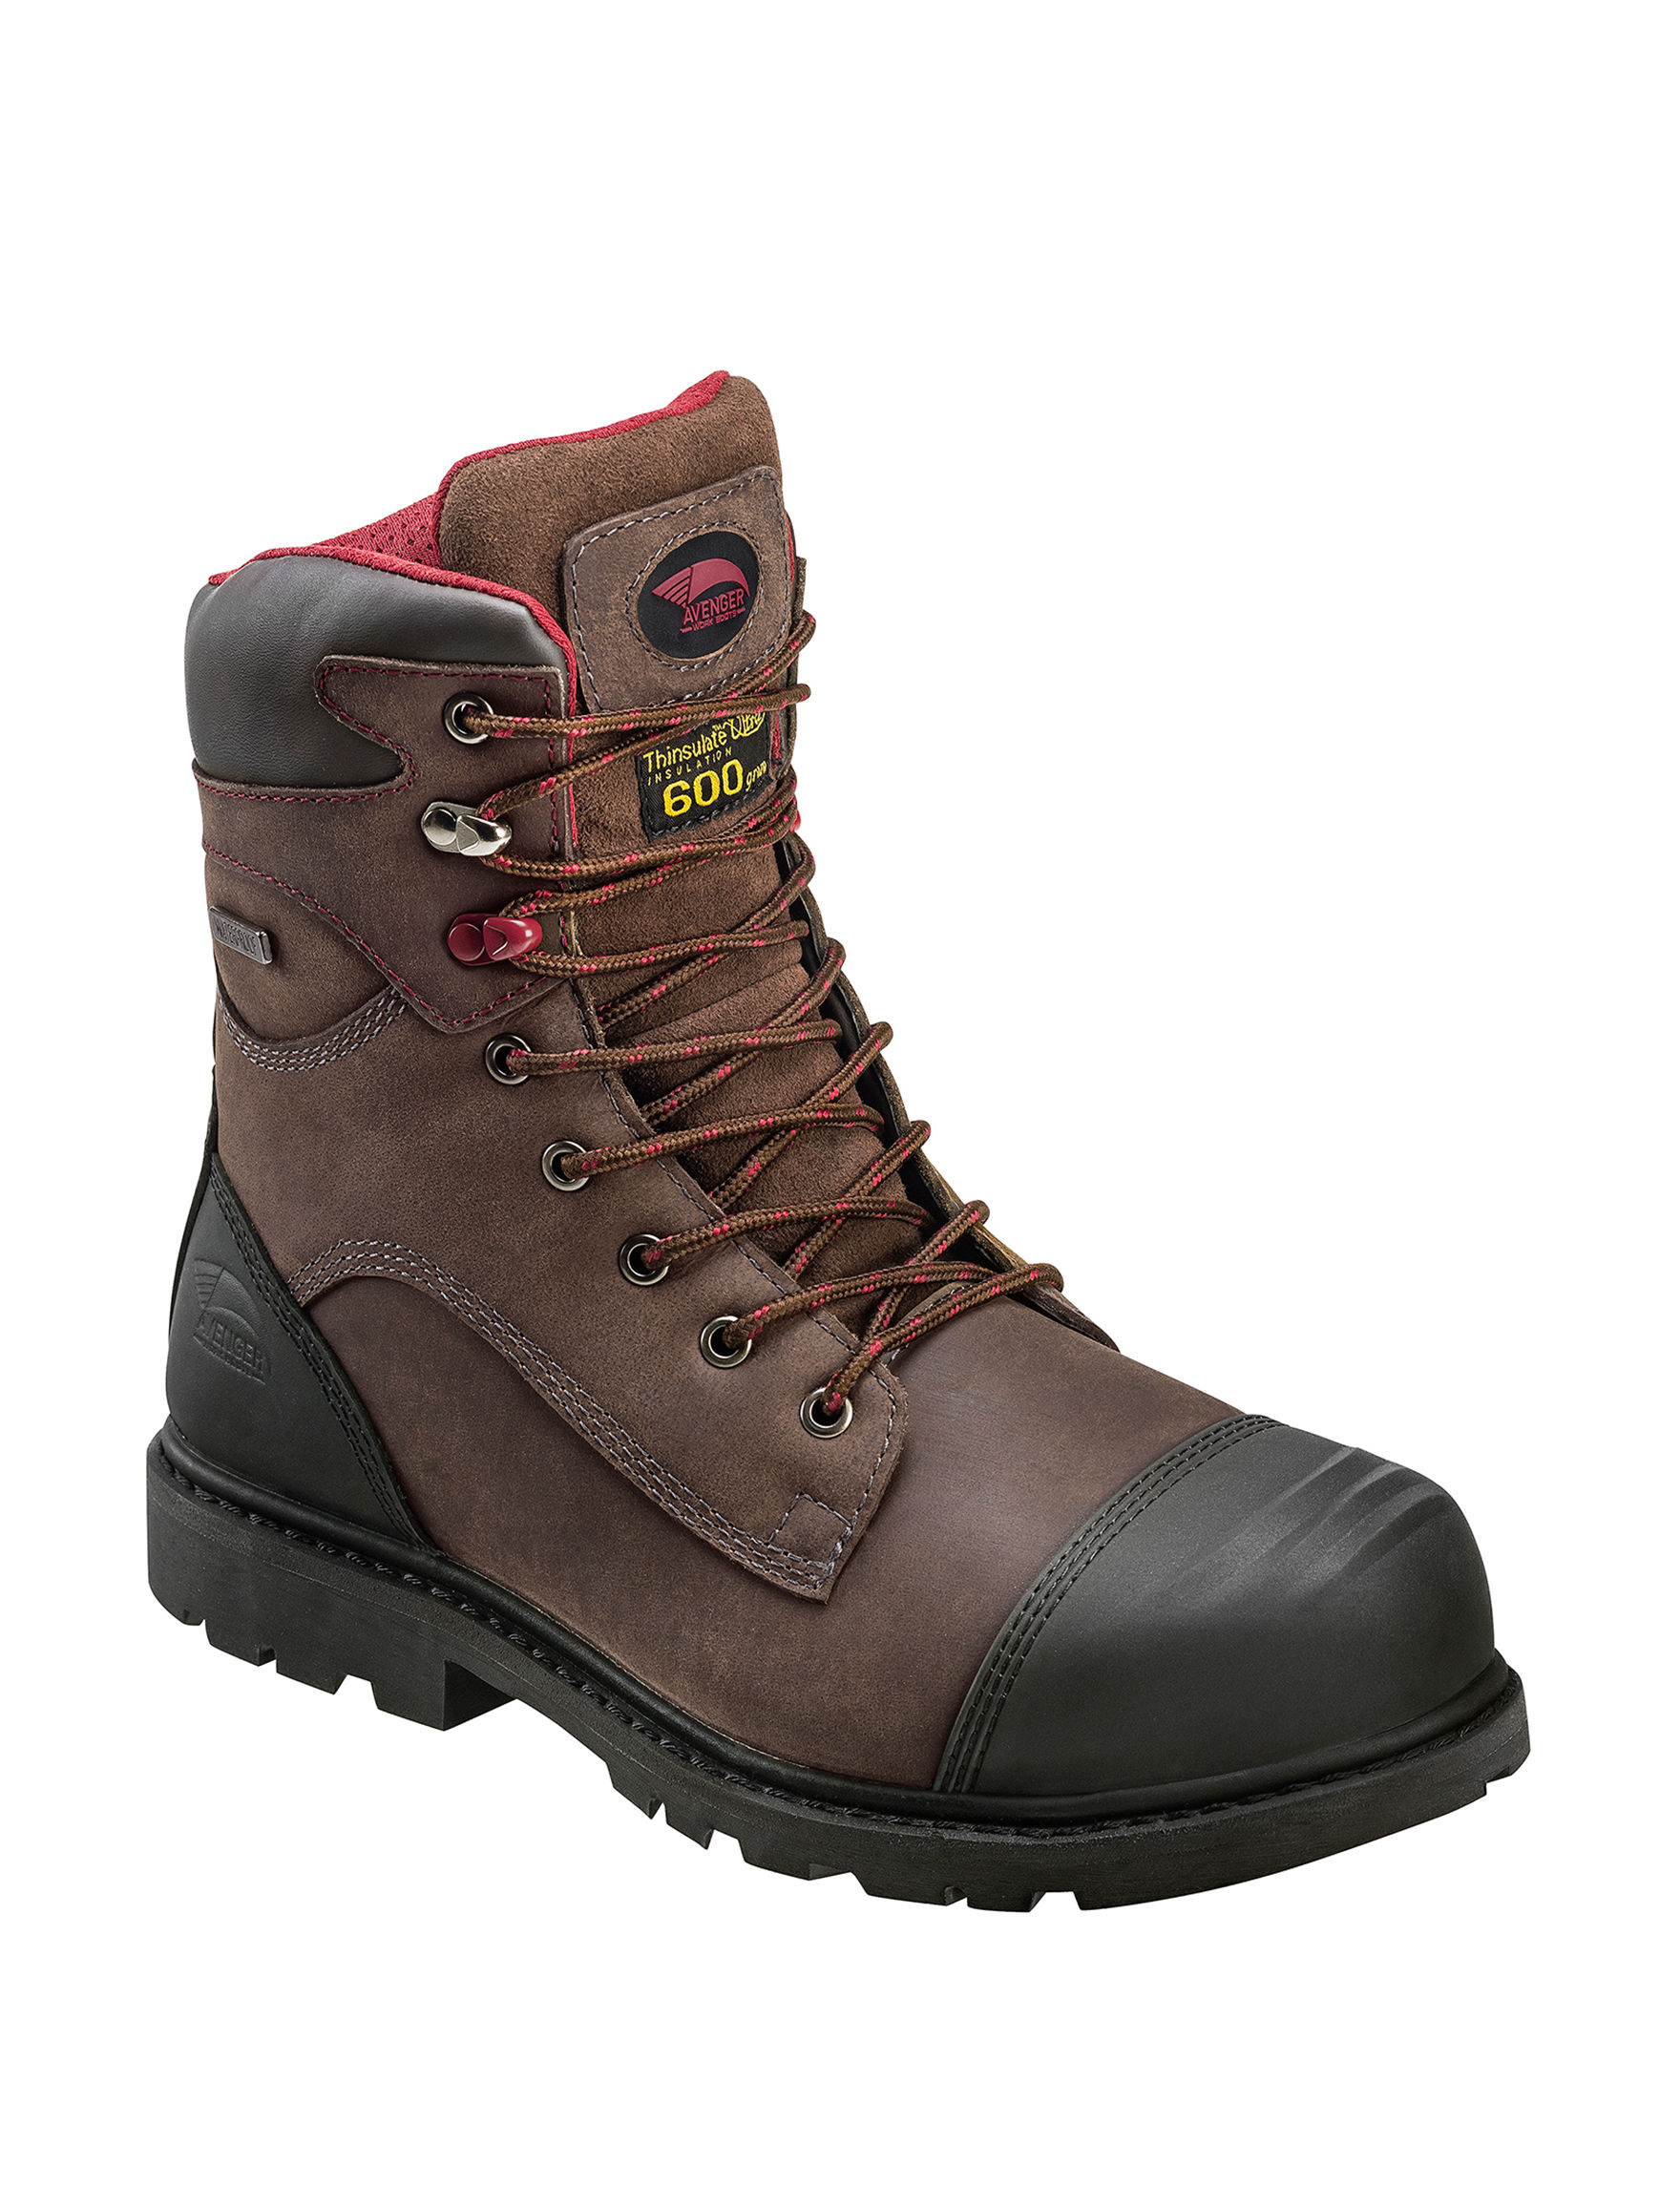 Avenger Brown Composite Toe Slip Resistant Waterproof